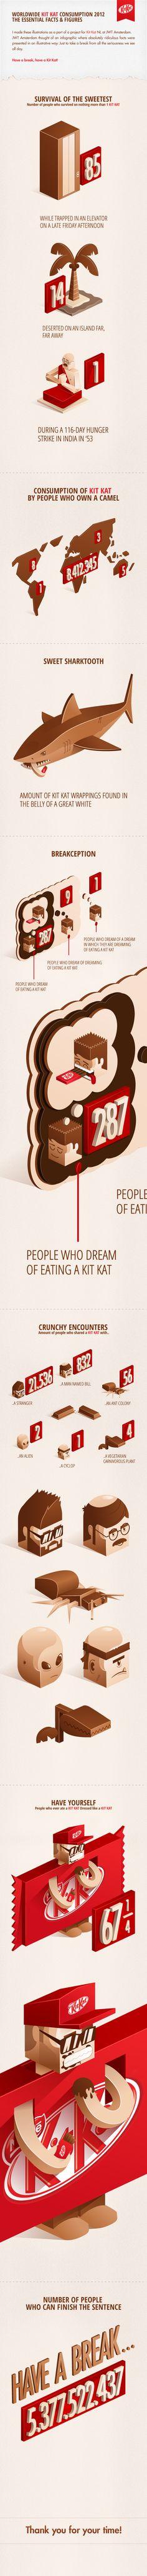 KIT KAT infographic 2012 by REFRESHH , via Behance